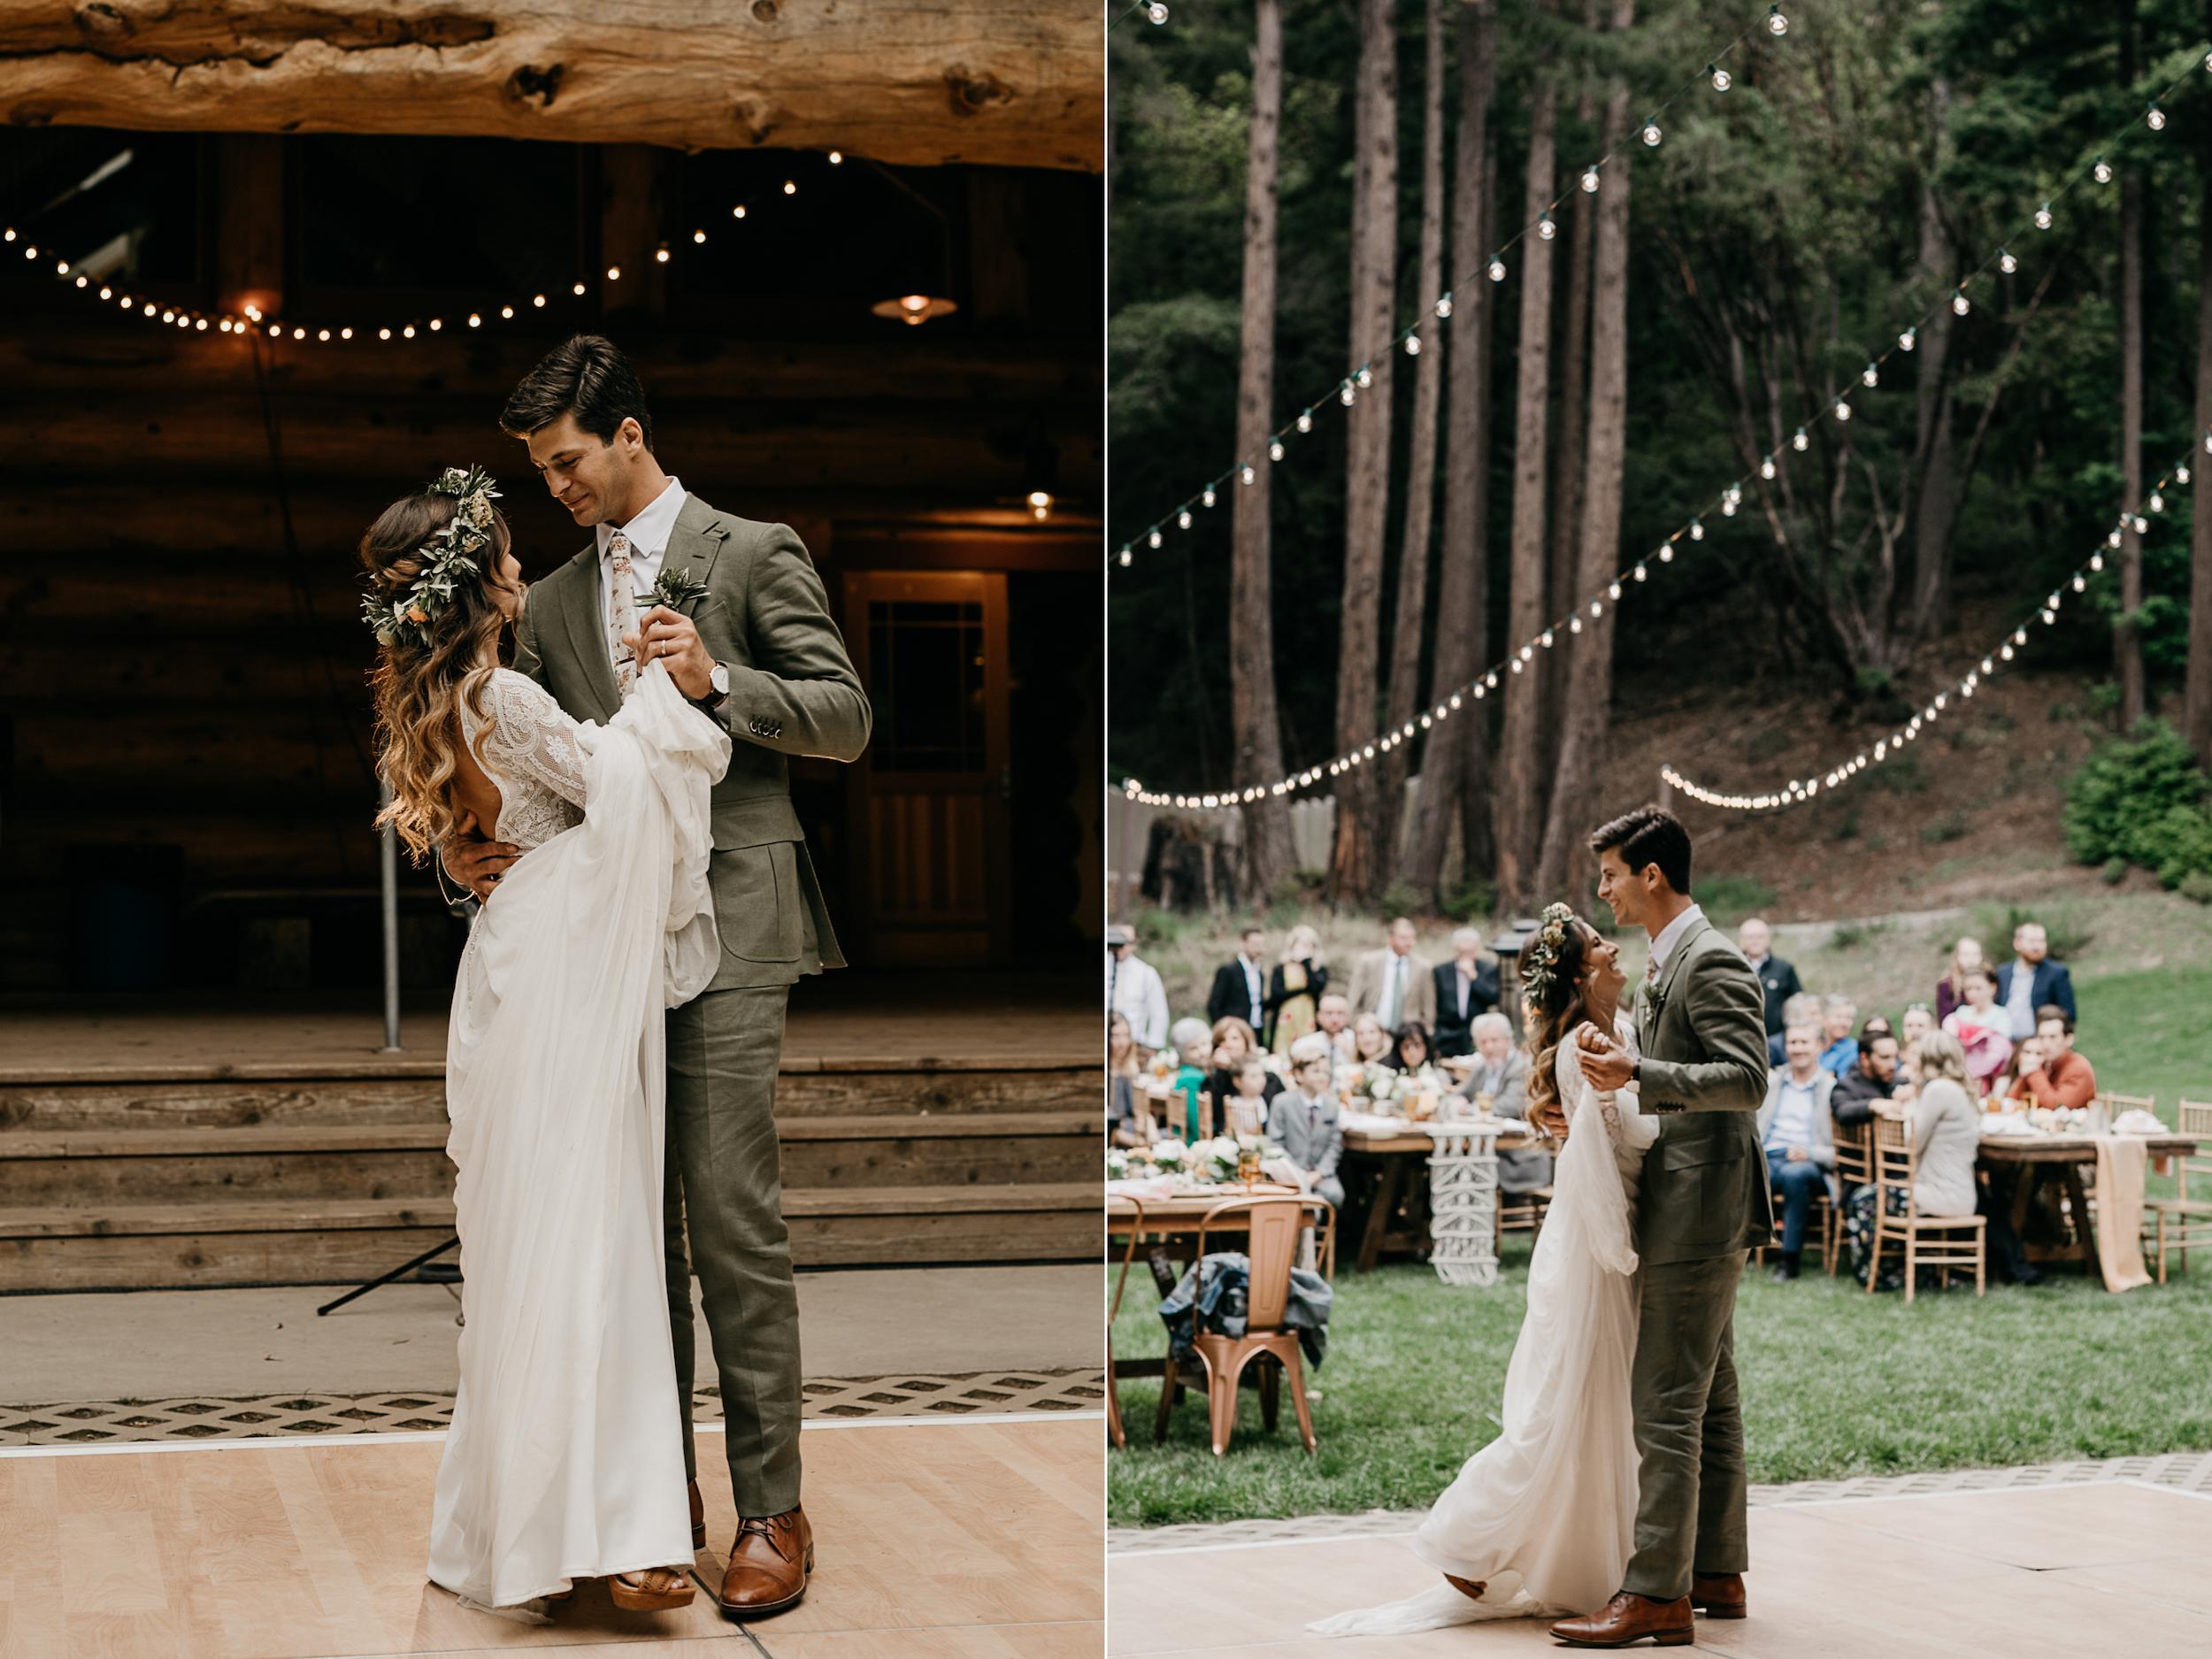 camp campbell-wedding-photographer038.jpg